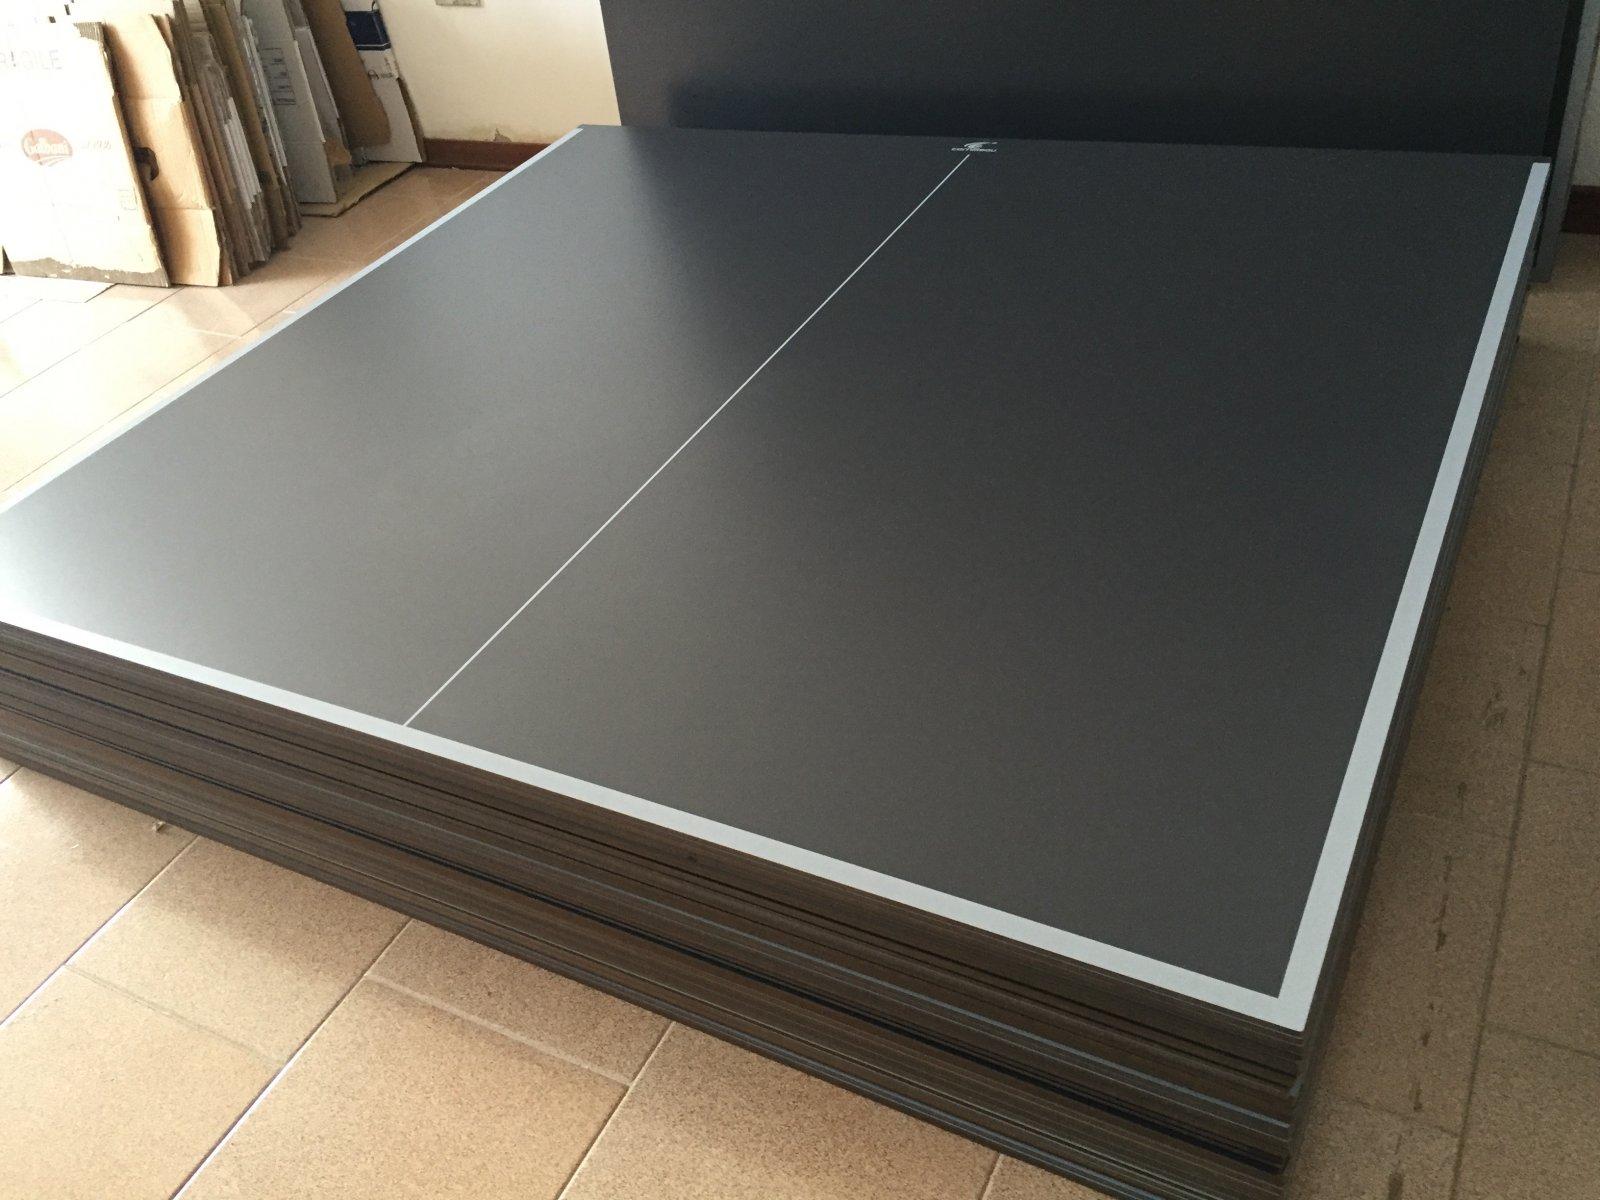 Piani pannelli per tavolo ping pong ping pong grigio regolamentari da esterno ebay - Tavolo ping pong misure regolamentari ...